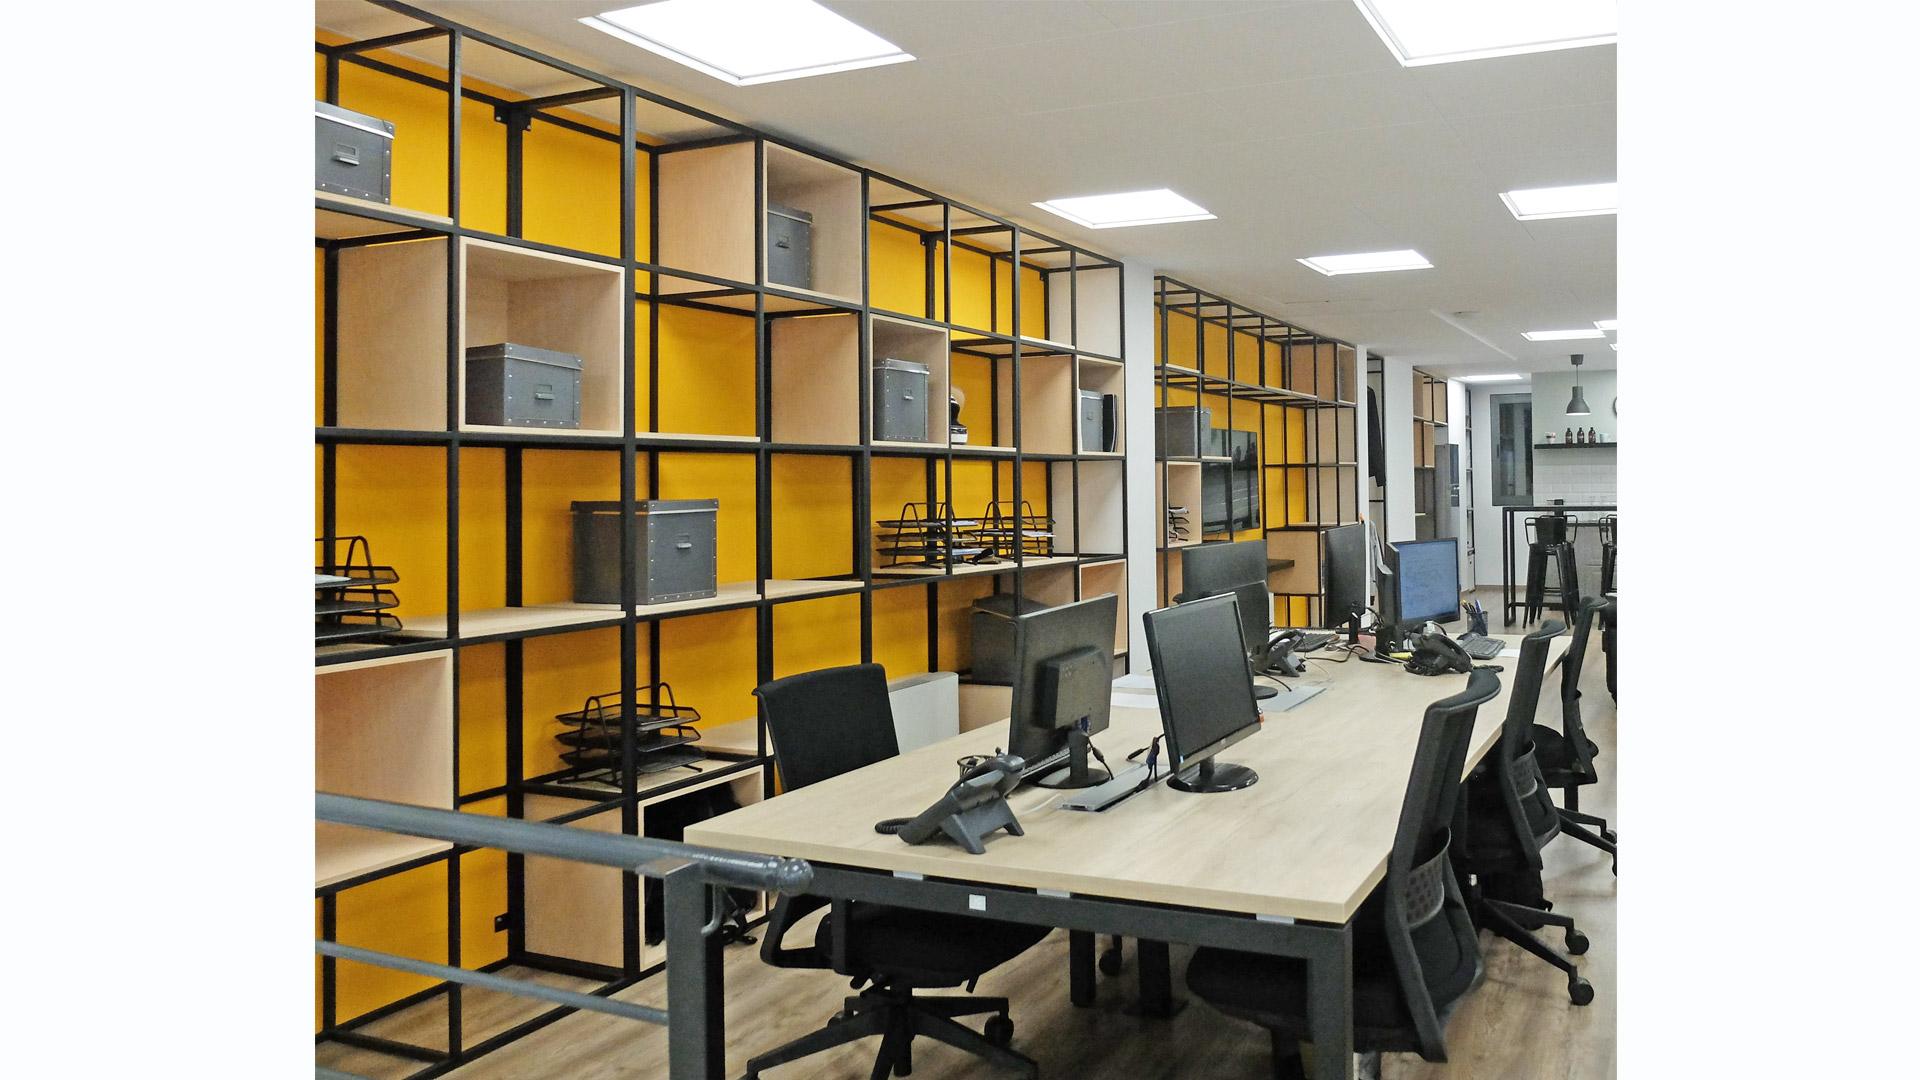 atelier4-anna-junca-interiorista-oficines-showroom-edyma-34-web